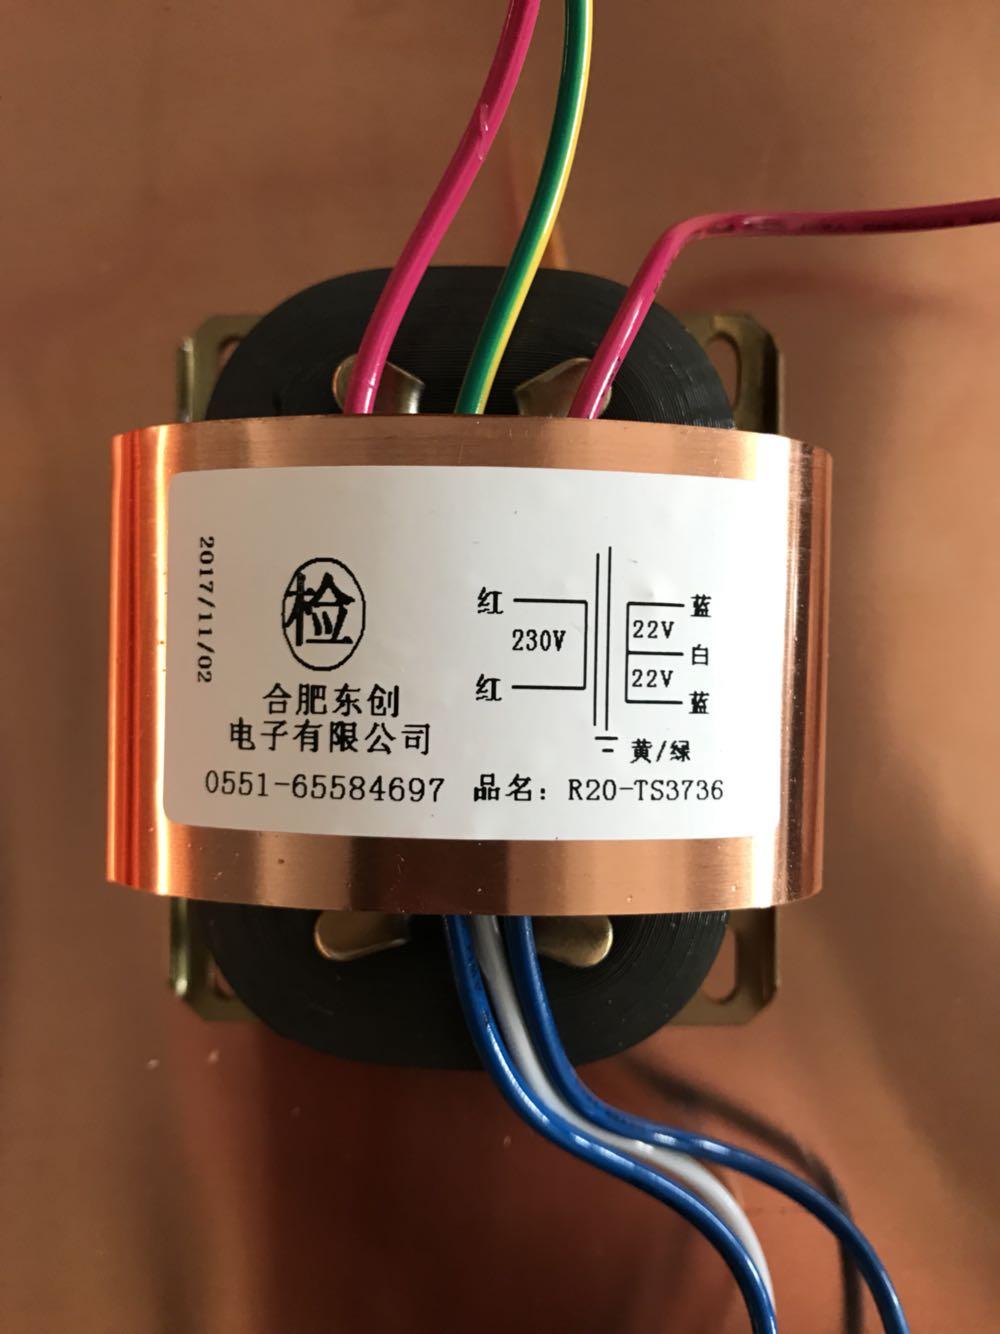 22V-0-22V 0.68A Transformer R Core R20 custom transformer 230V 30VA copper shield for DAC pre-amplifier HIFI decoder 2500pcs zmm22v ll 34 zmm 22v 1 2w 1206 22v 0 5w smd